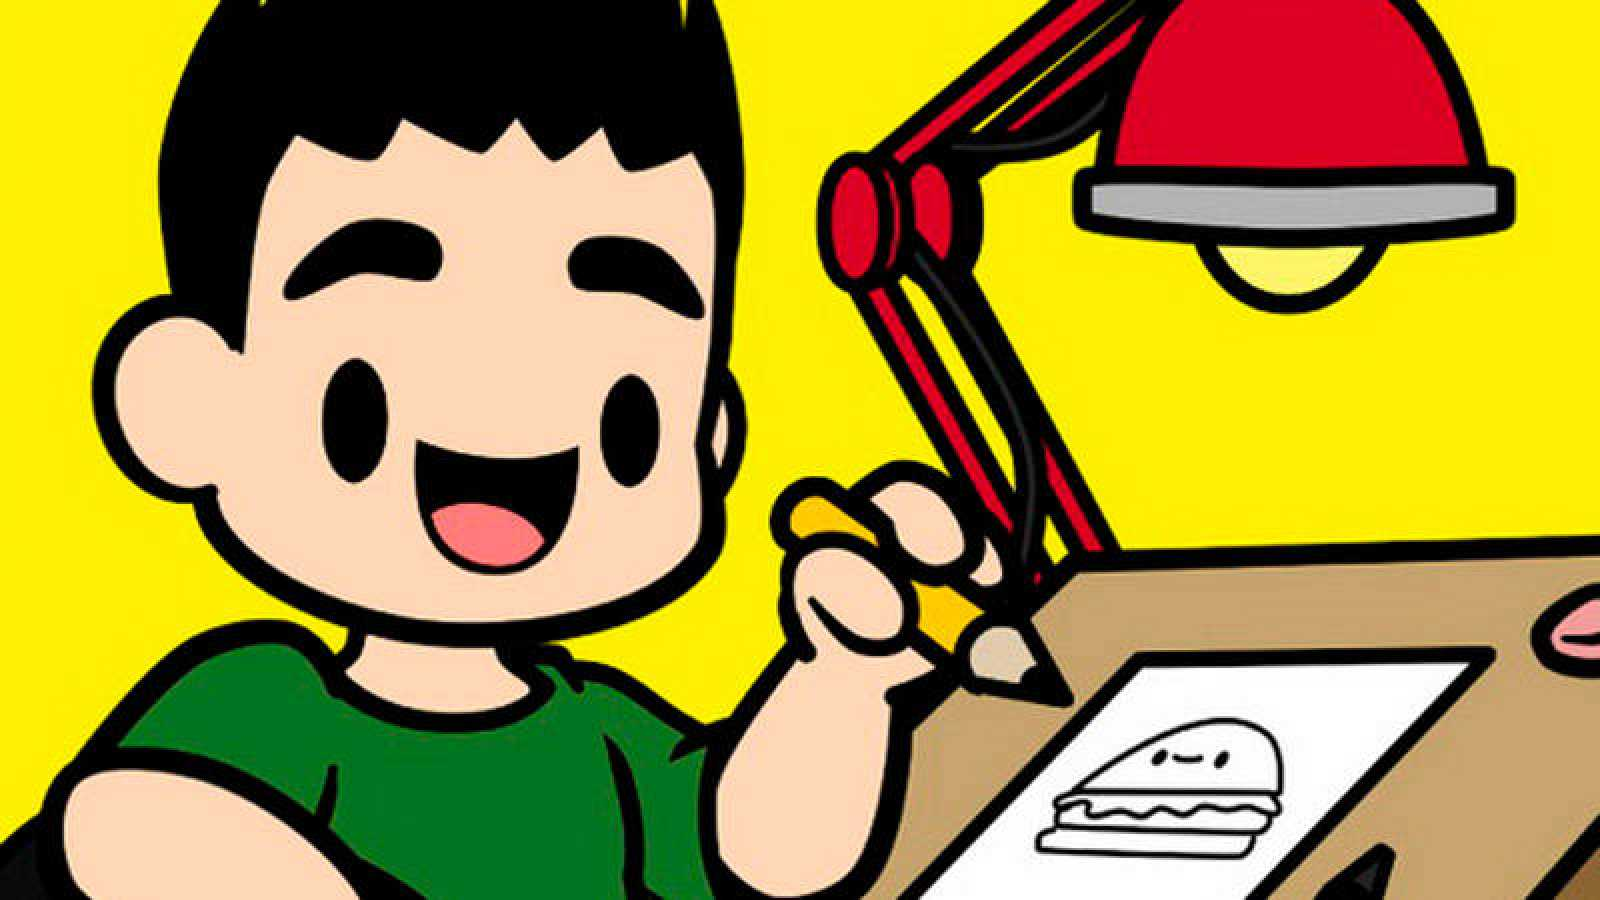 Fragmento de la portada de 'Cómo dibujar kawaii'